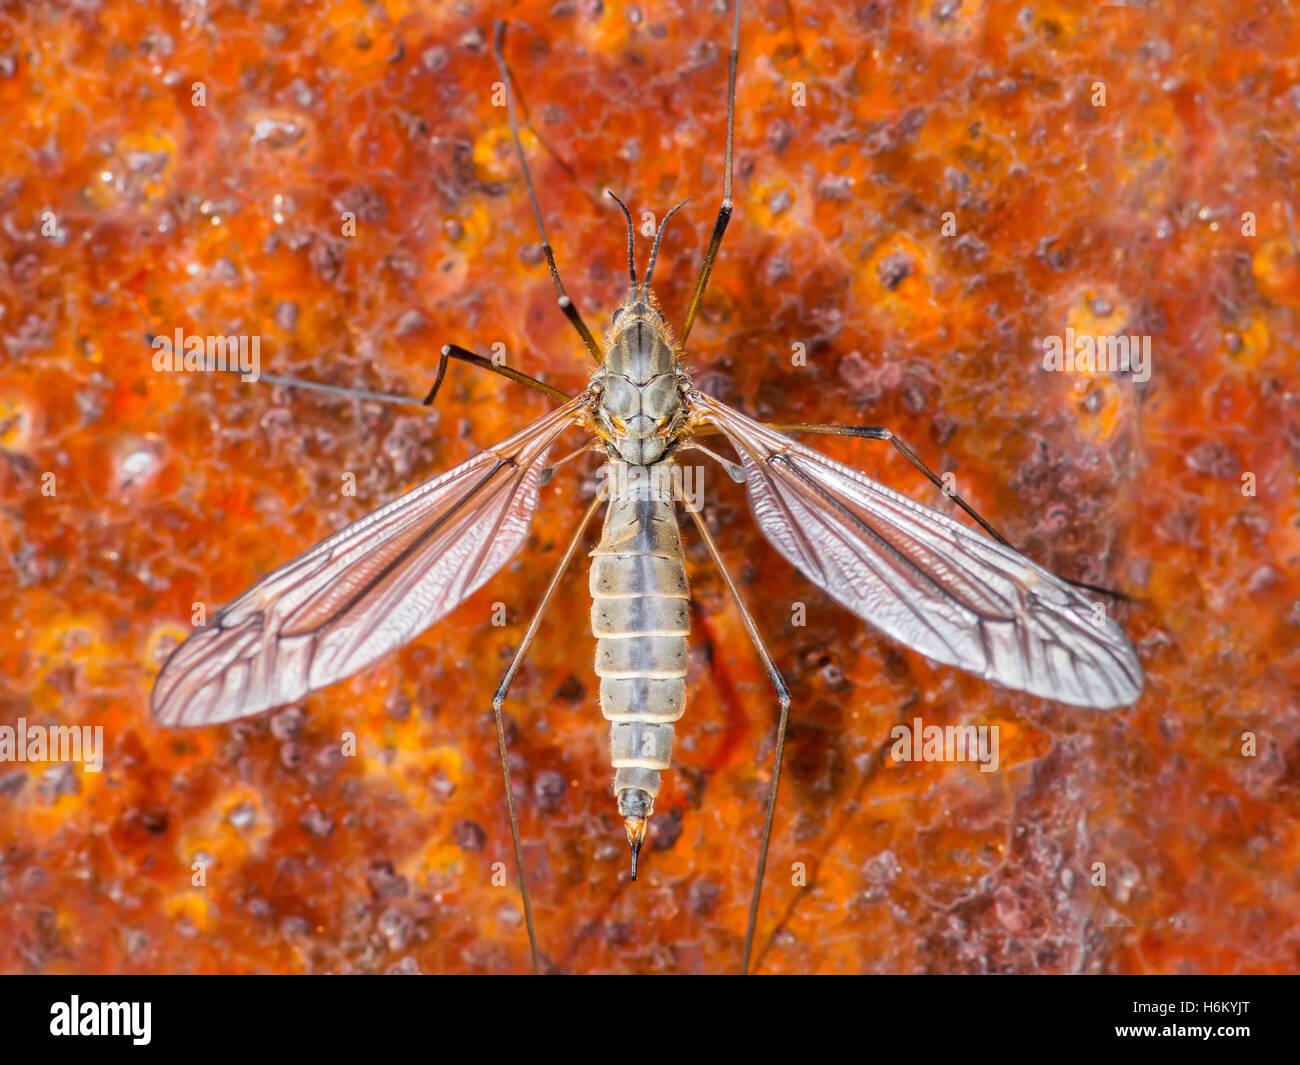 Zika virus Mücke auf rotem Hintergrund Stockbild